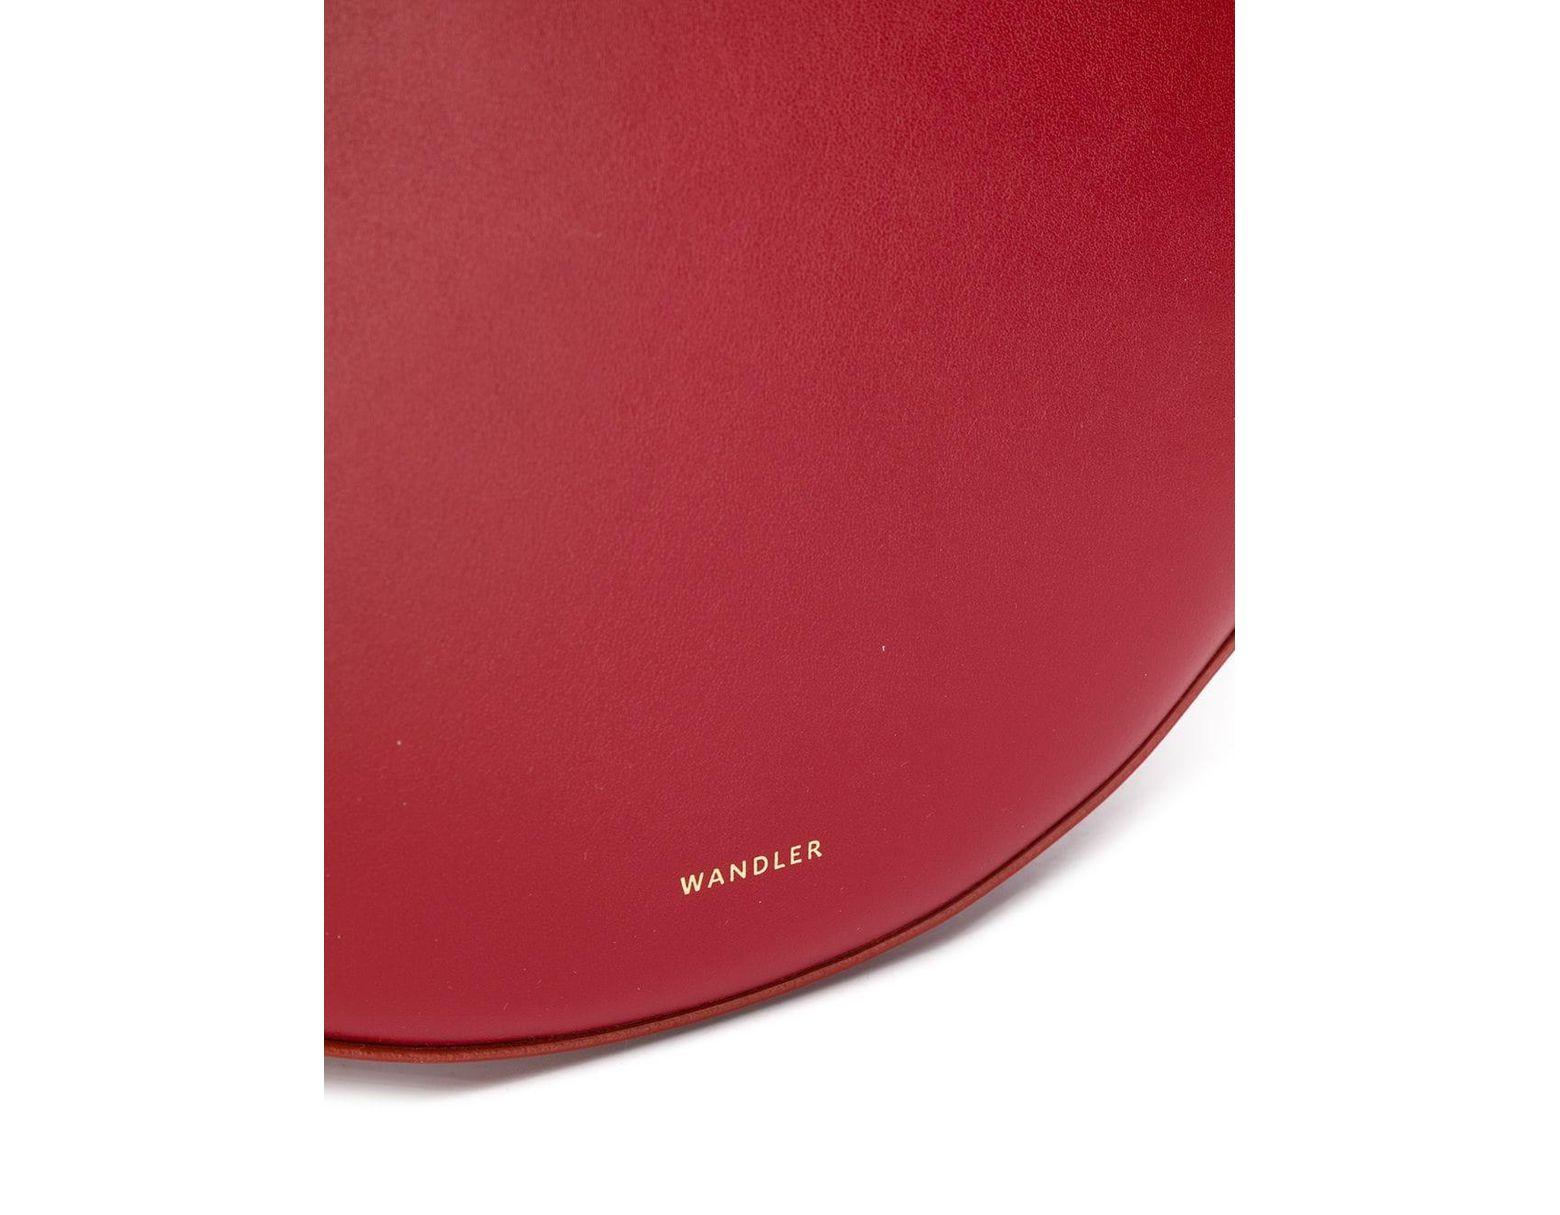 3b327aeebd Wandler Hortensia Medium Tote Bag in Red - Lyst